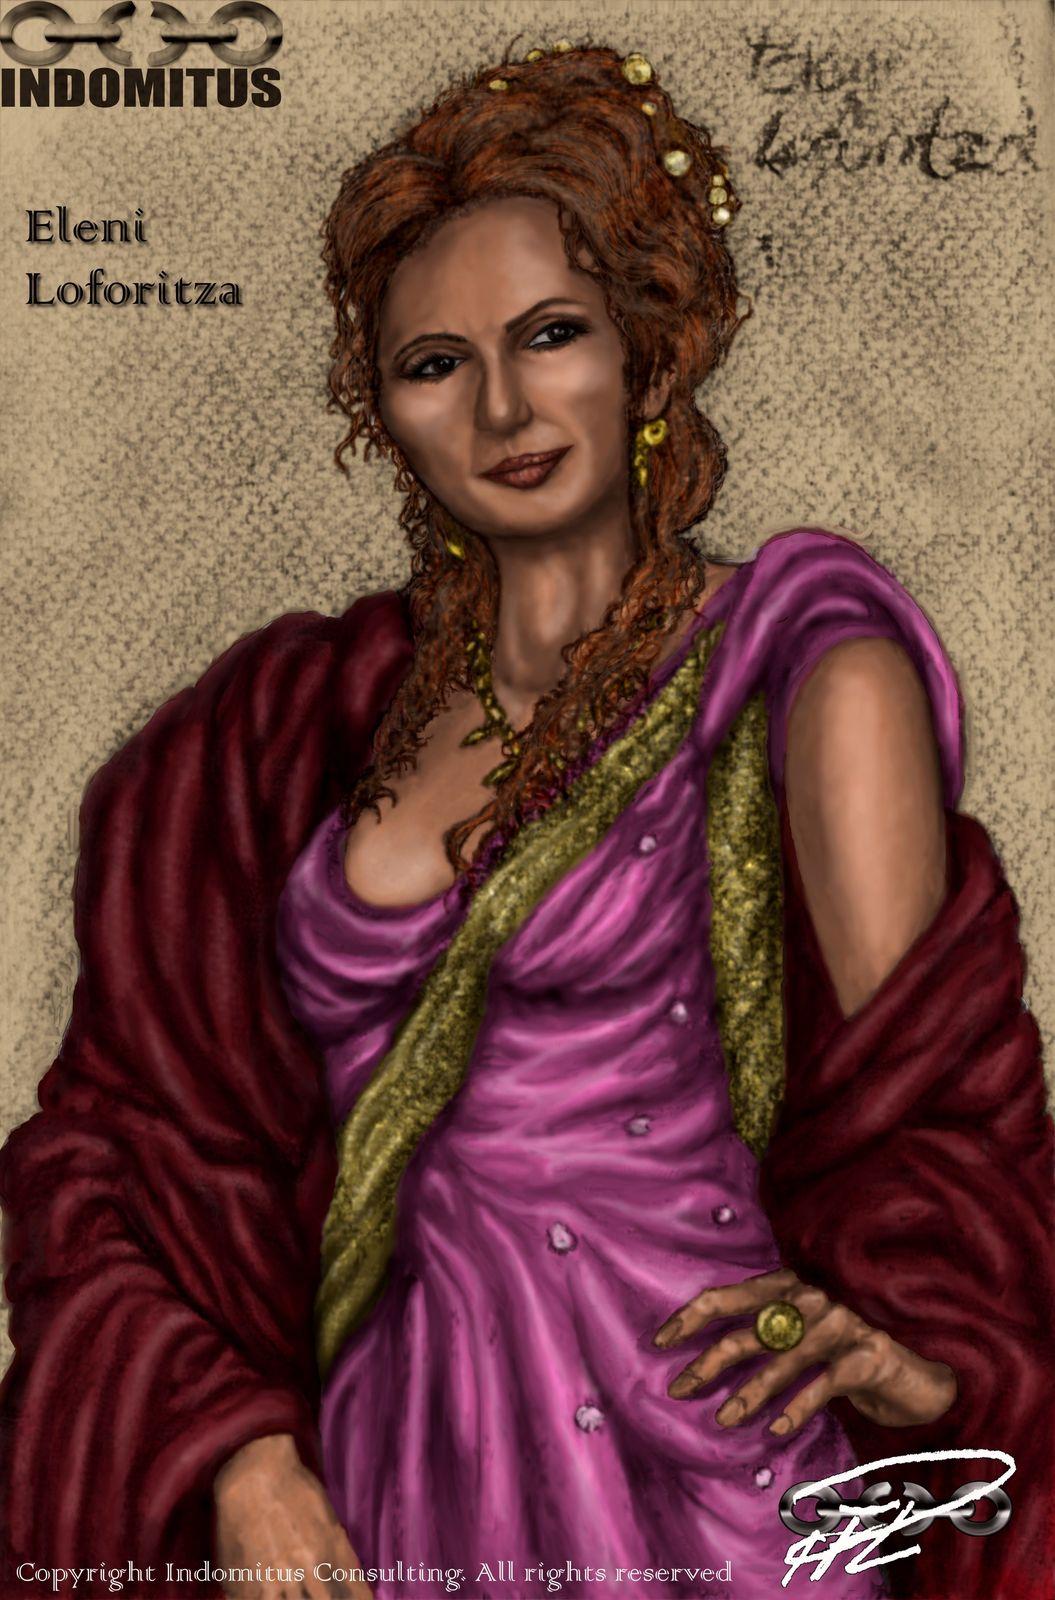 Eleni Loforitza kol b&w smetad färg copy renderad resize byzantine bysantinsk stola tunika